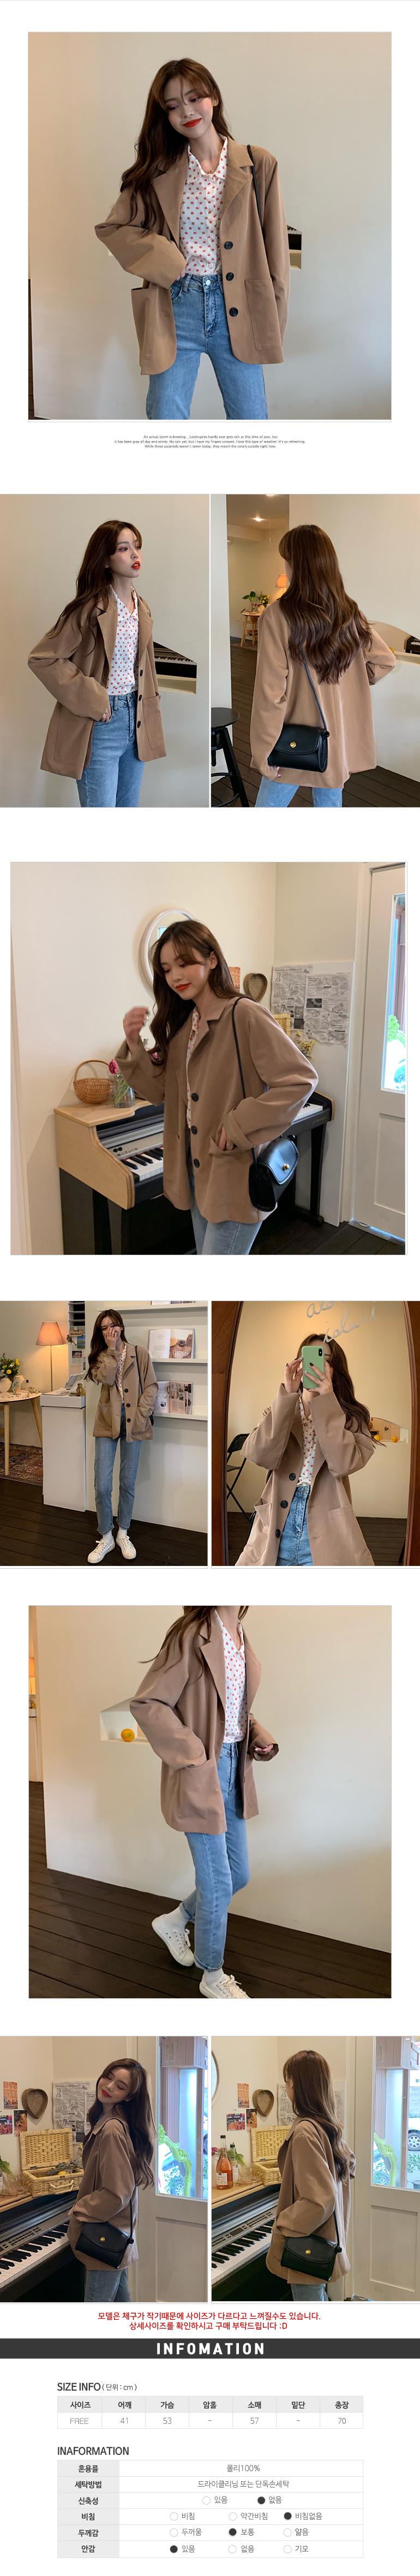 Blonde jacket